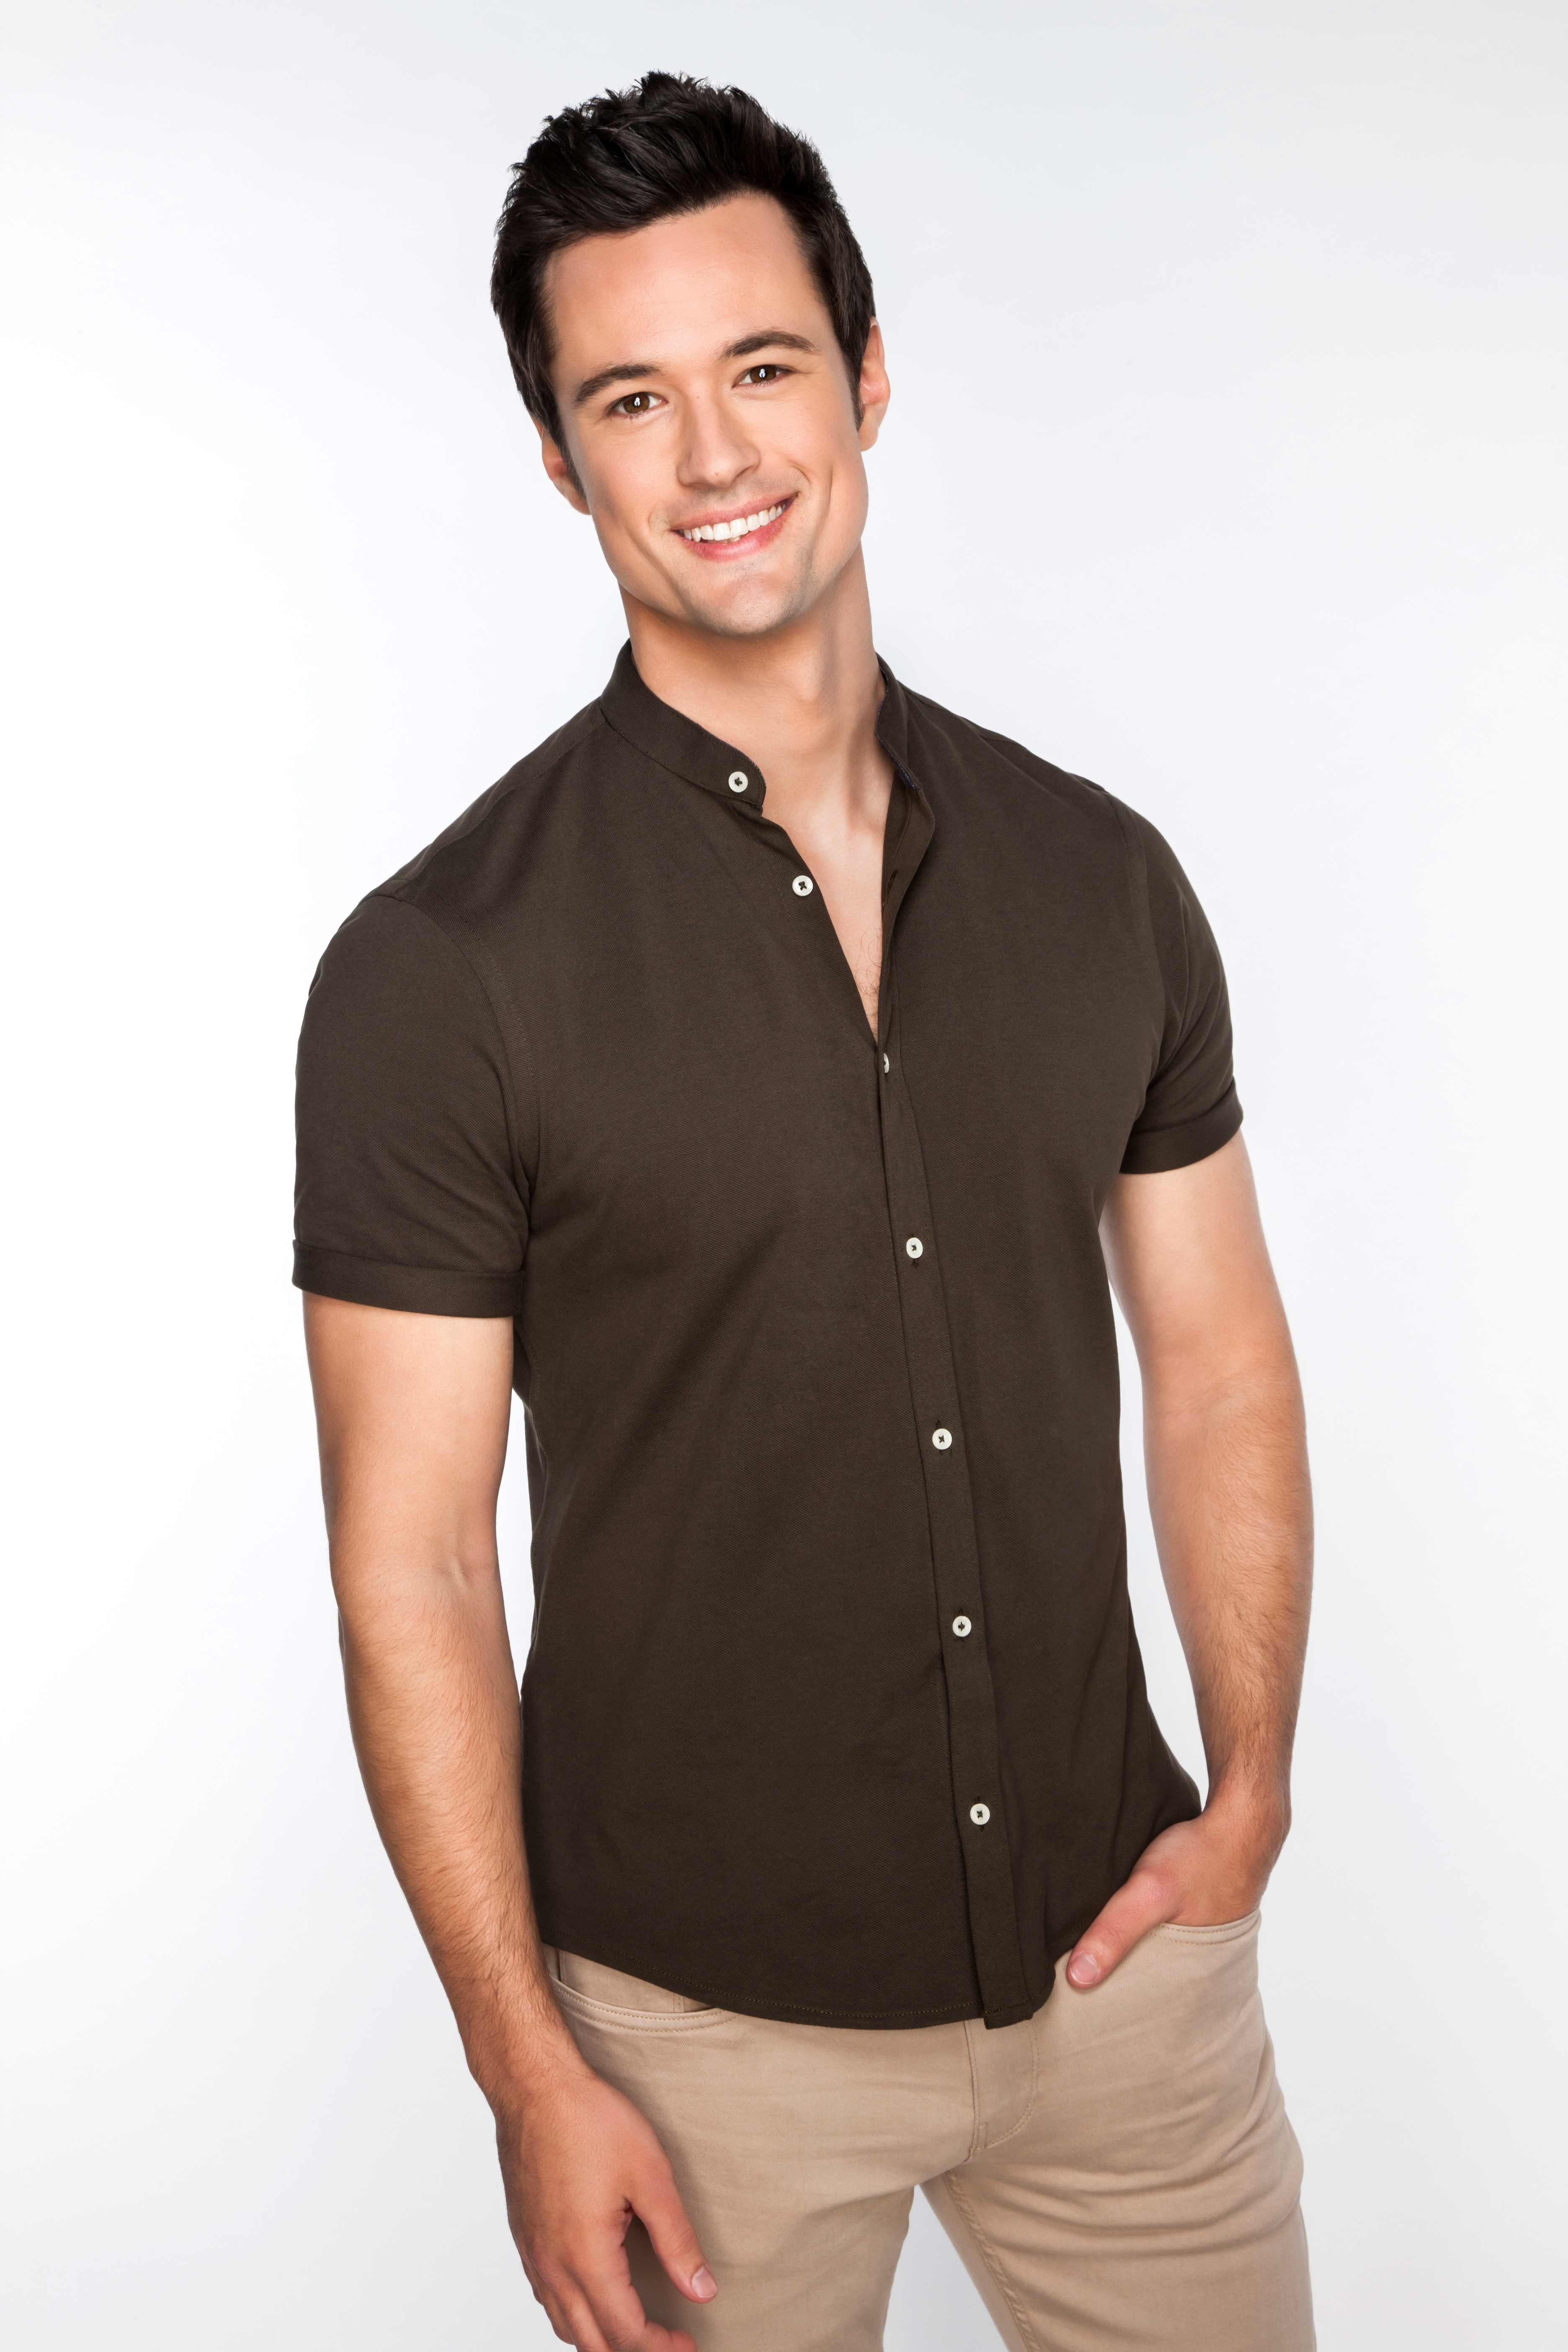 Matthew Atkinson from soap opera The Bold and the Beautiful.